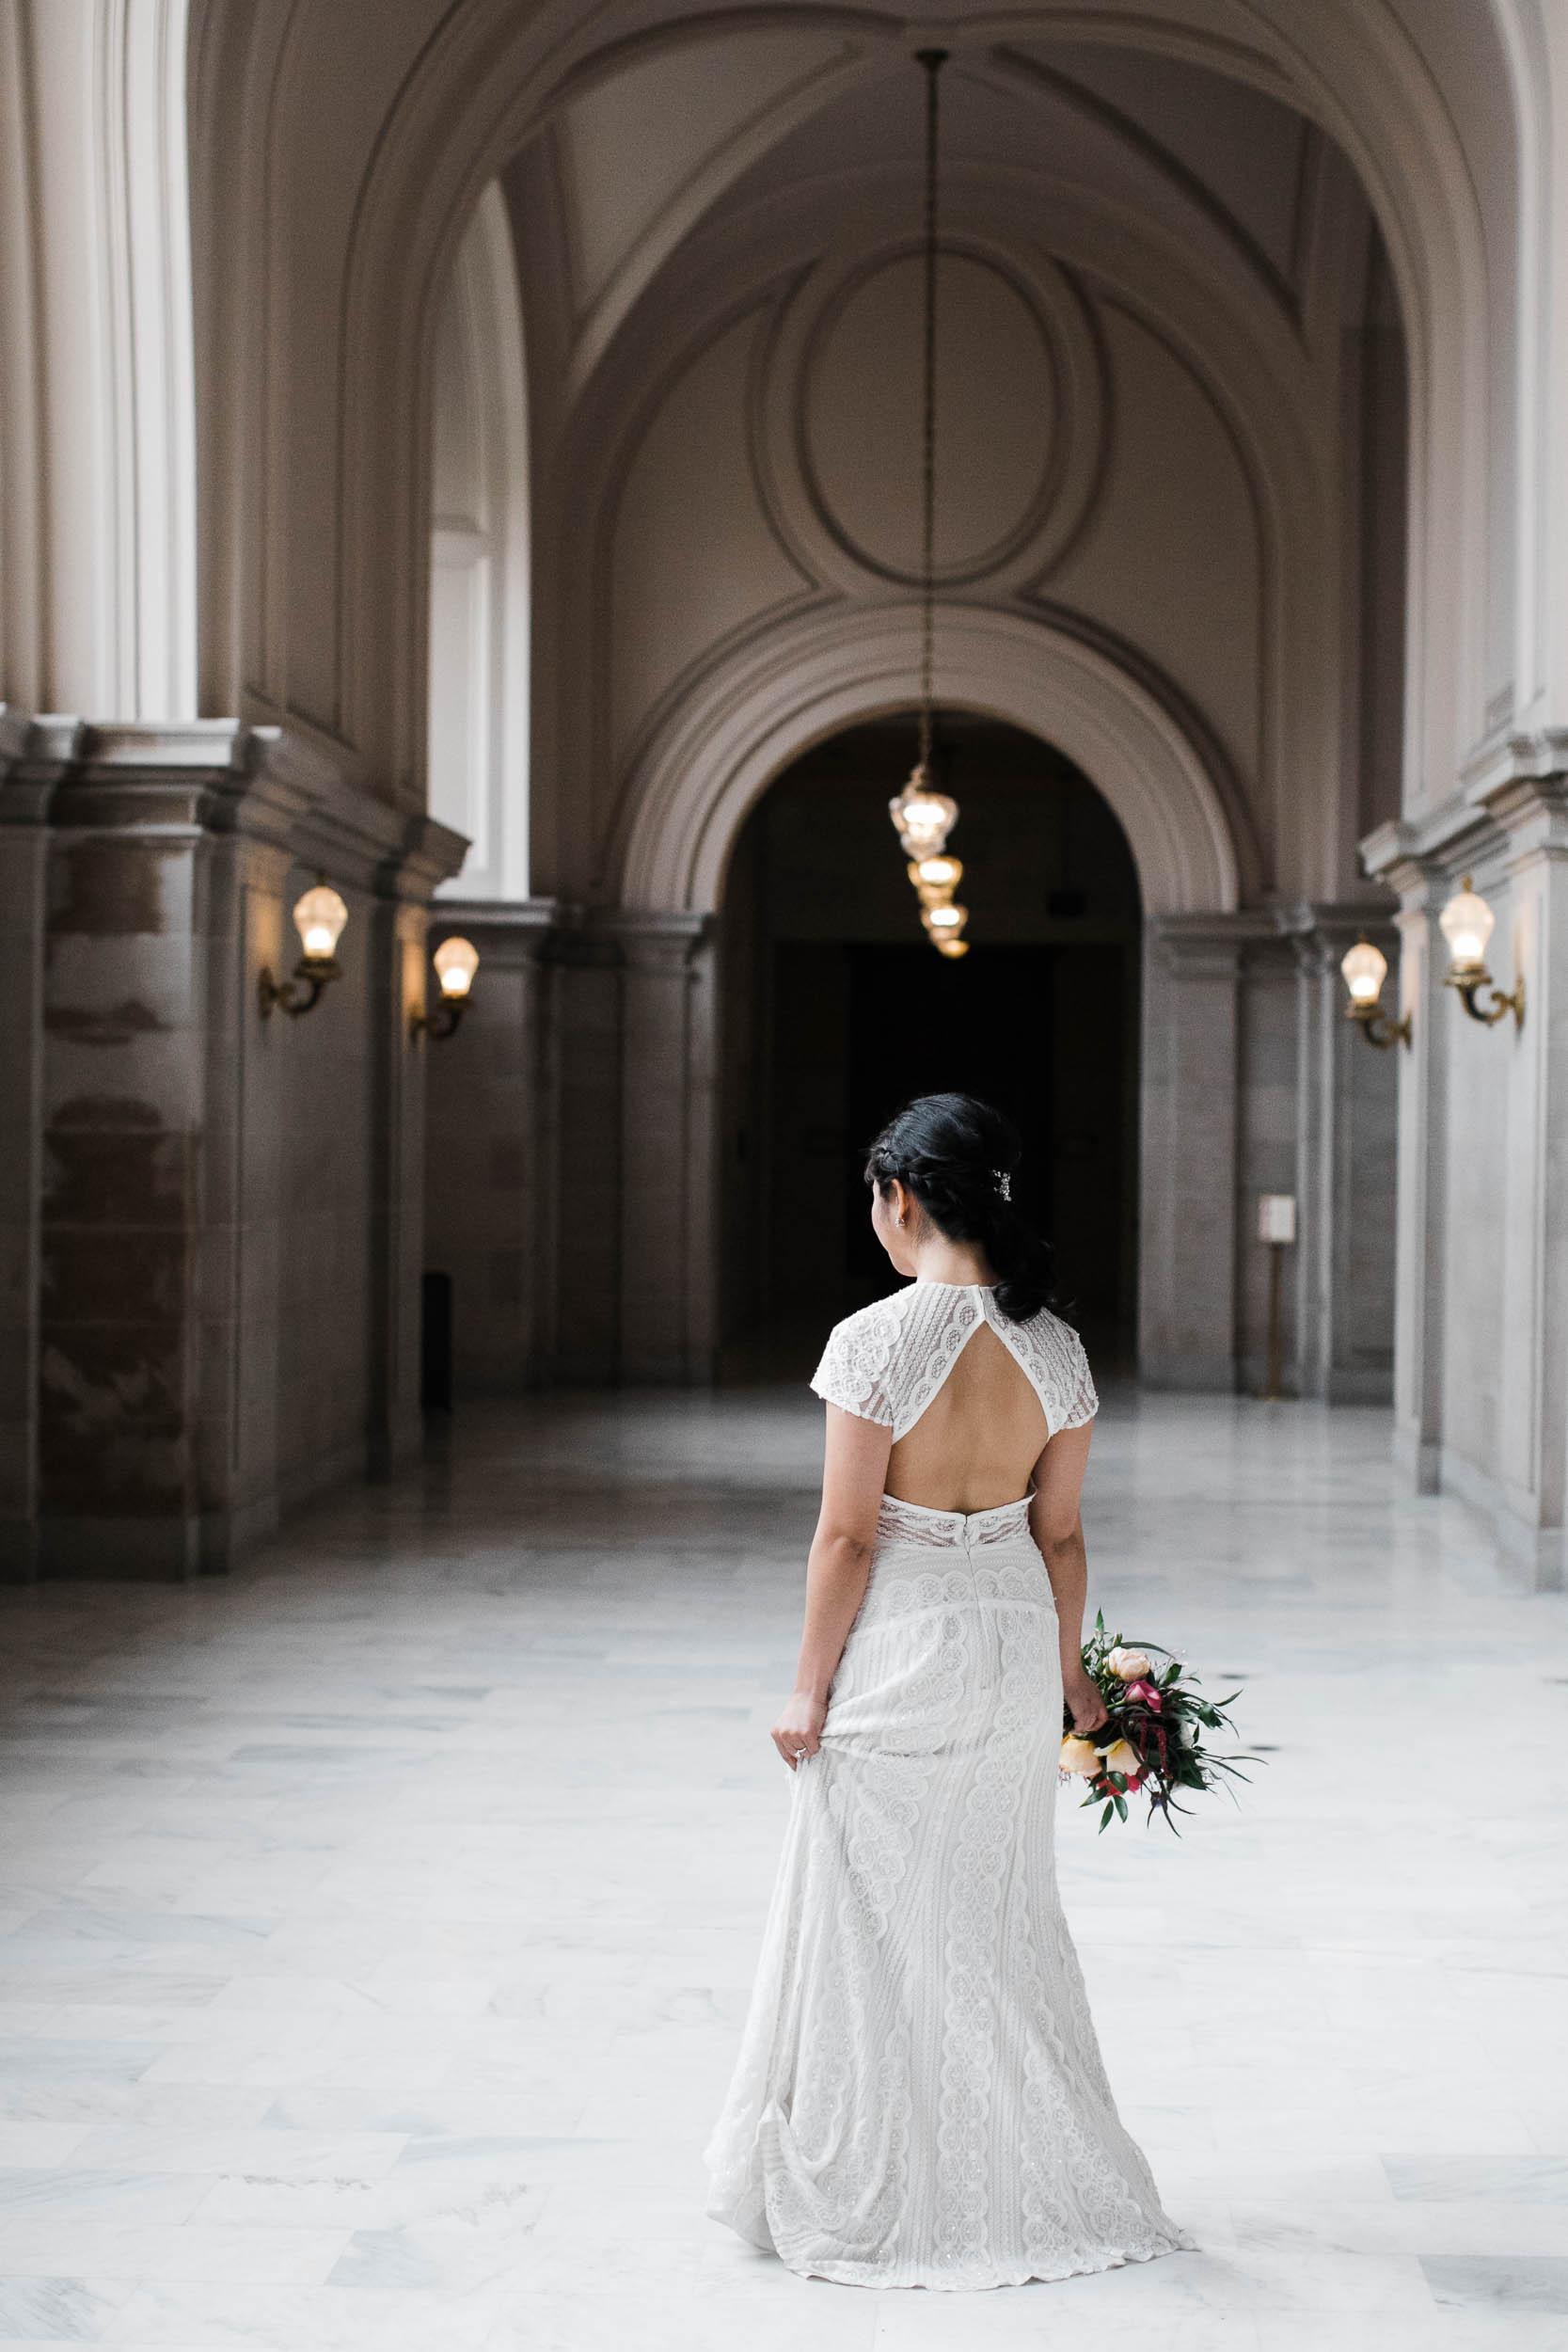 032118_M+D City Hall Wedding_Buena Lane Photography_0398.jpg